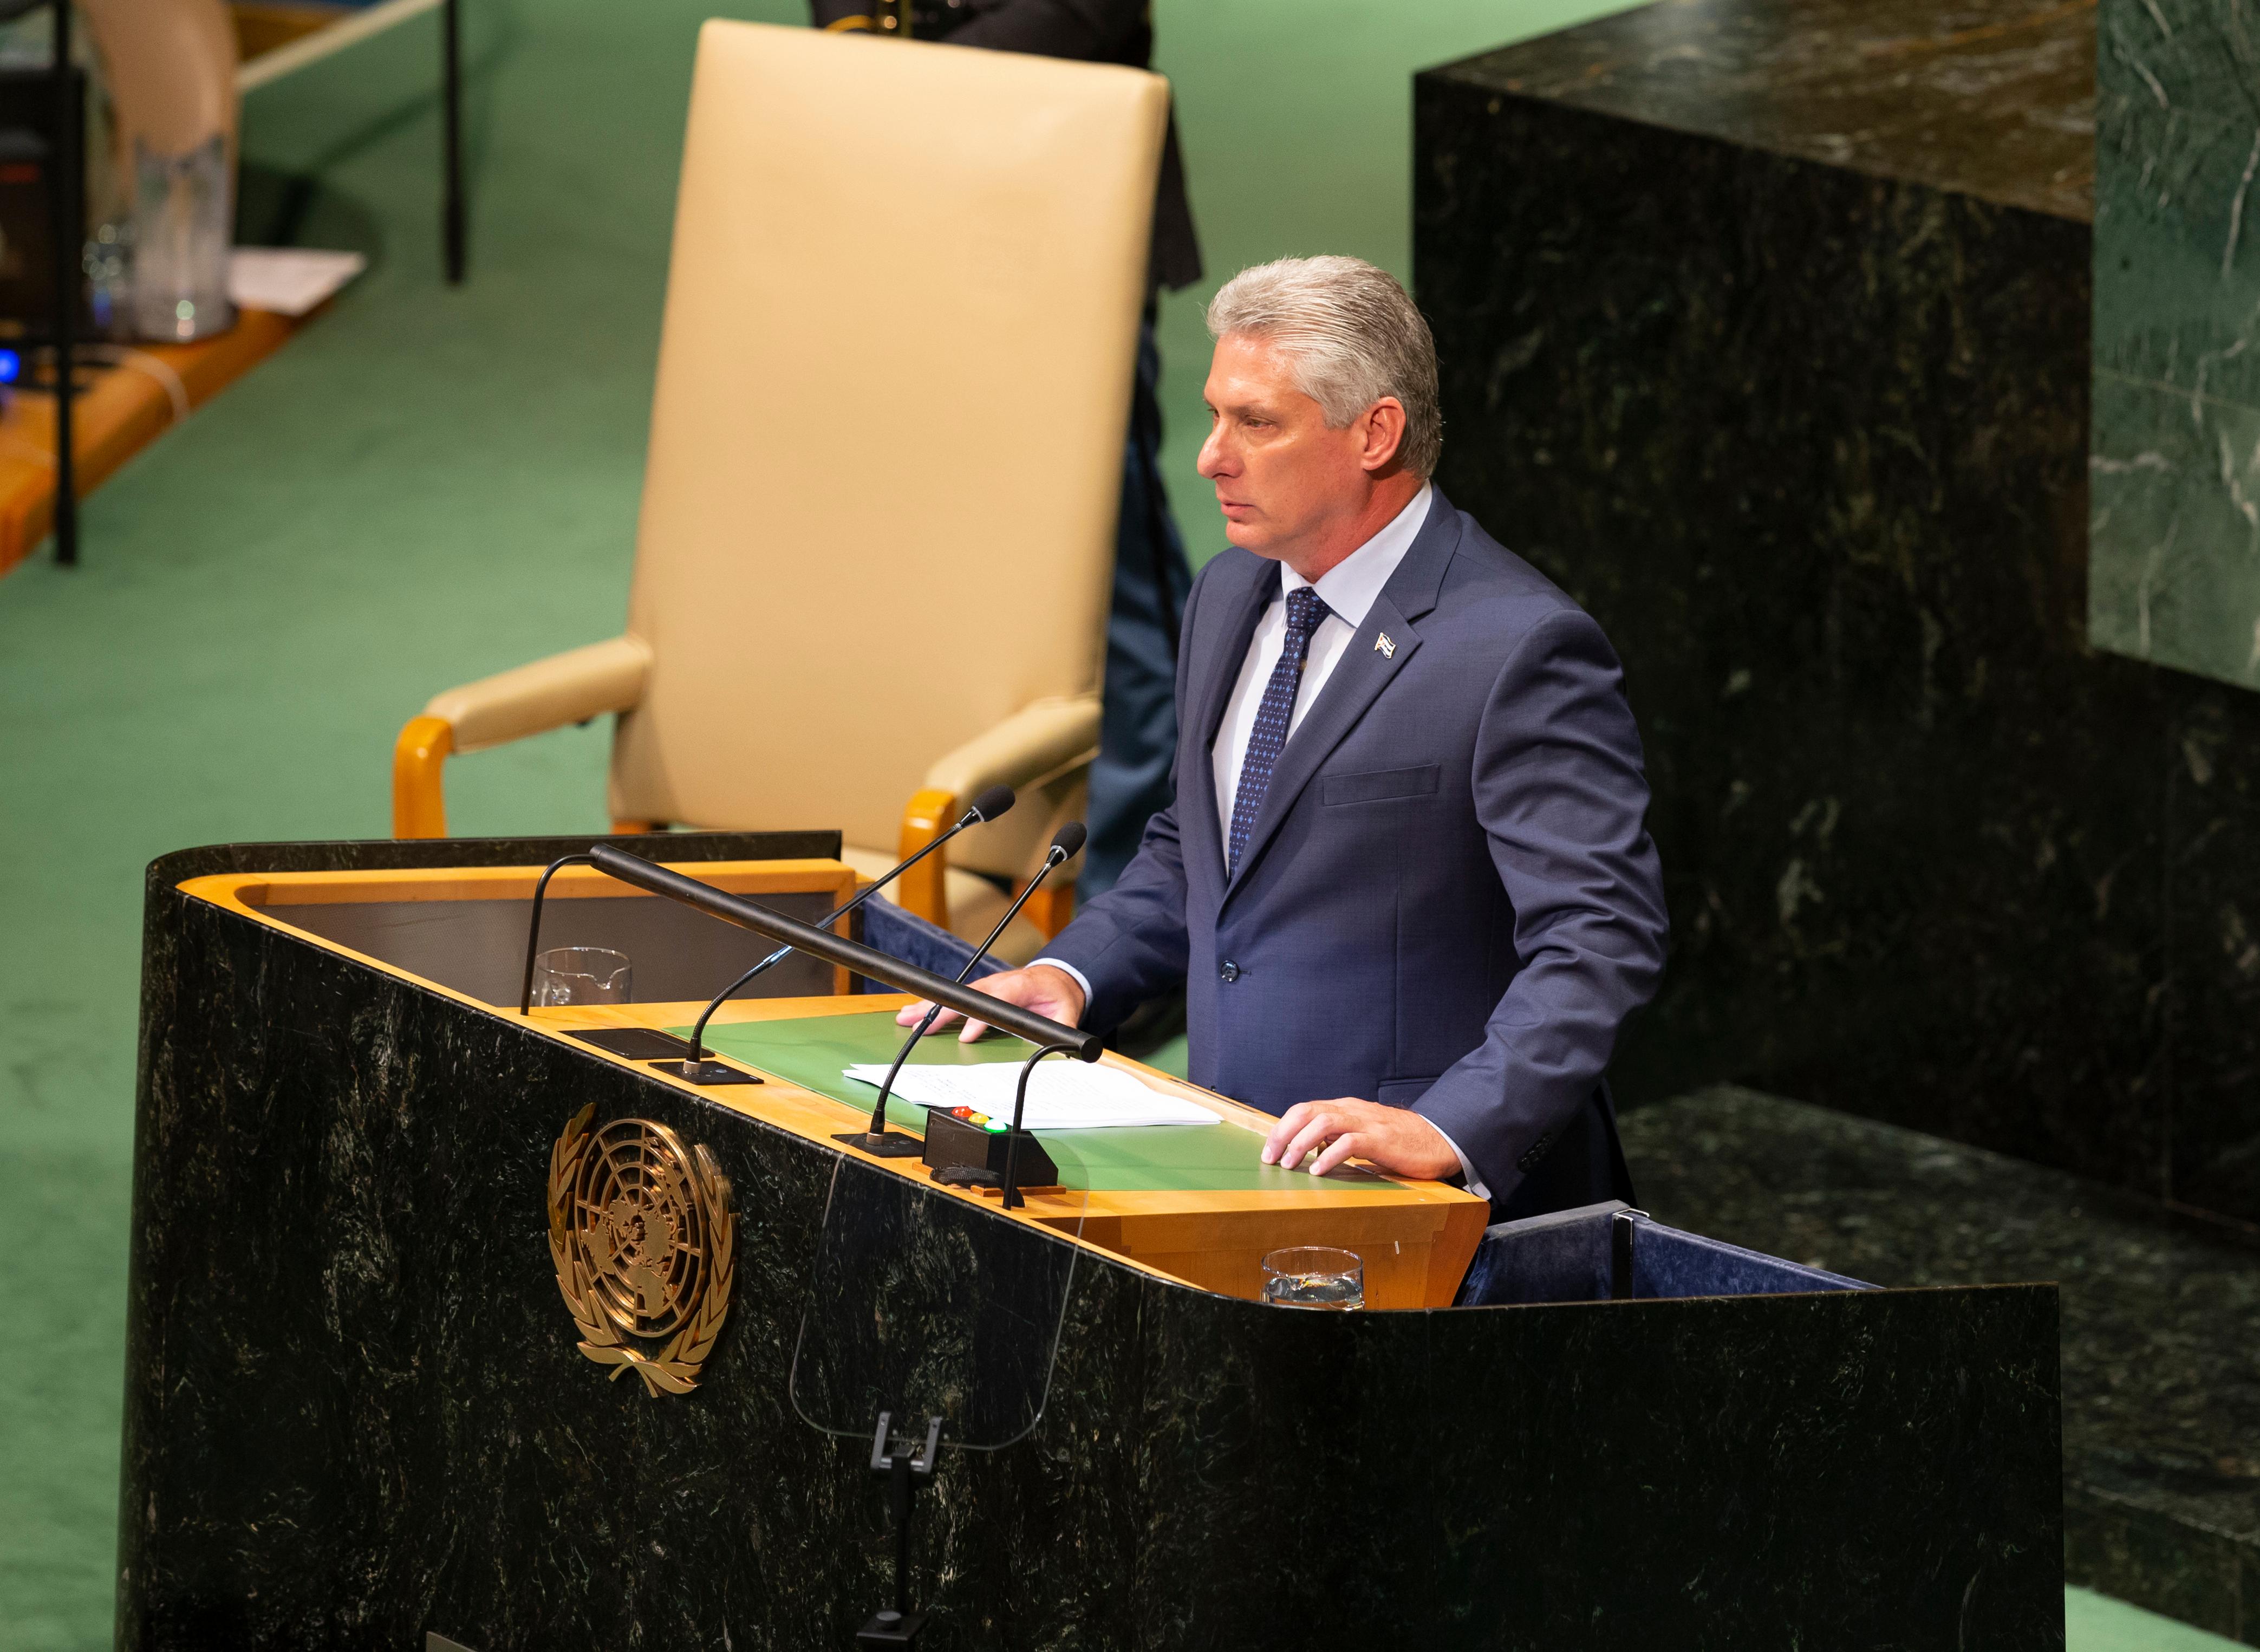 Pictured is Cuban President Miguel Díaz-Canel. SHUTTERSTOCK/ lev radin